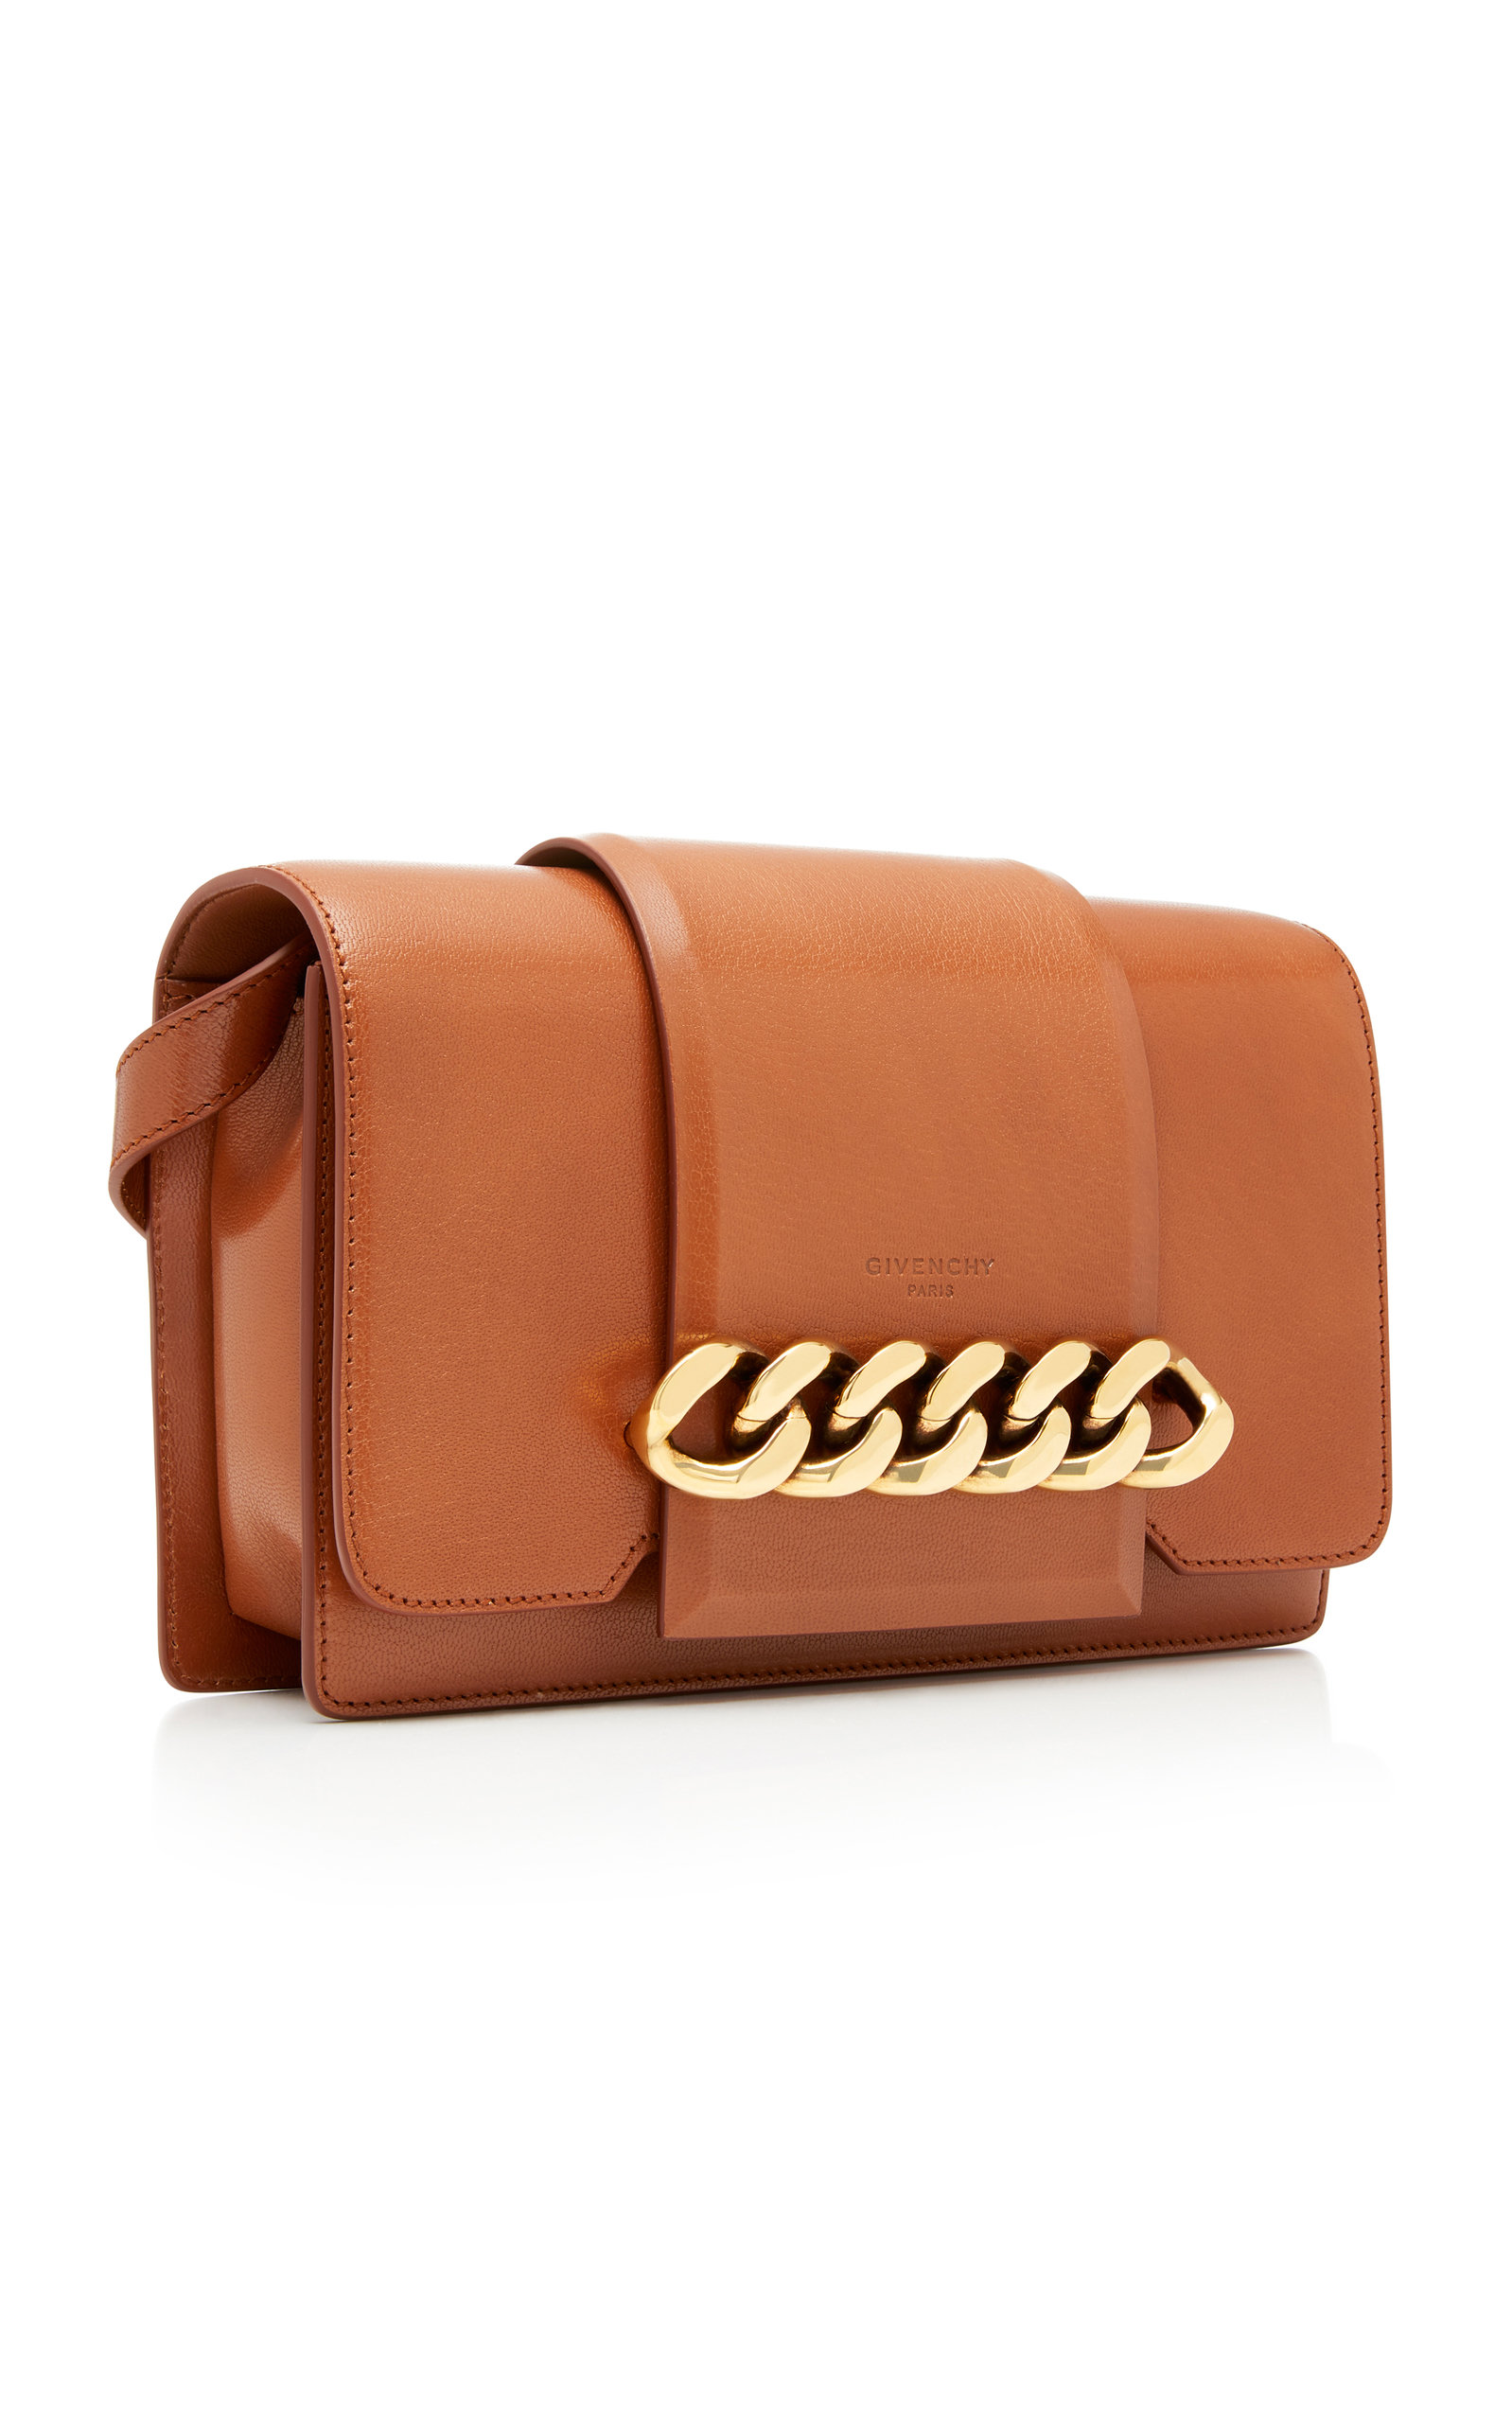 5e9b7483d594 GivenchyInfinity Chain-Trimmed Leather Shoulder Bag. CLOSE. Loading.  Loading. Loading